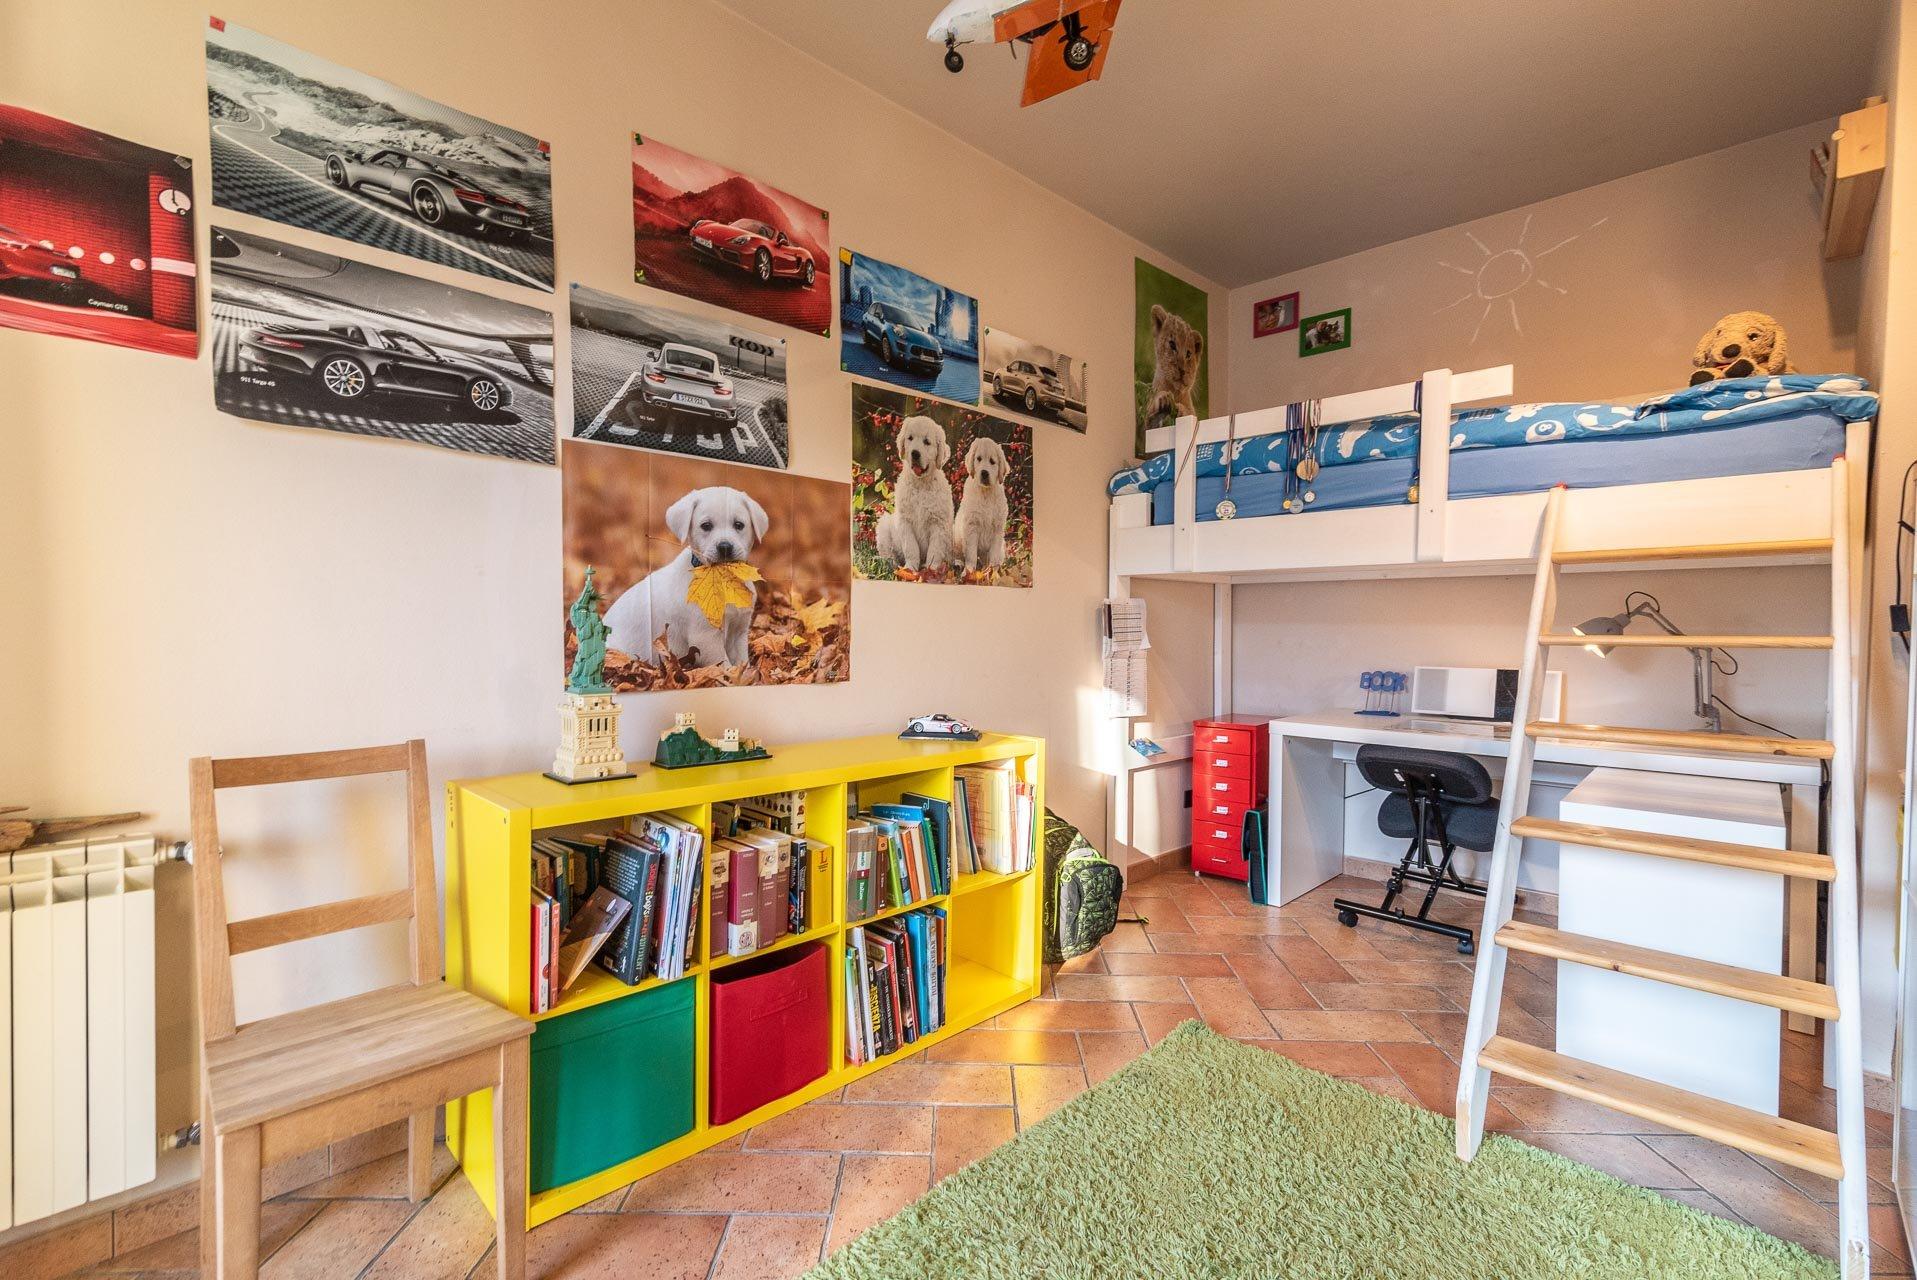 Country house for sell in Paruzzaro - mezzanine single bedroom